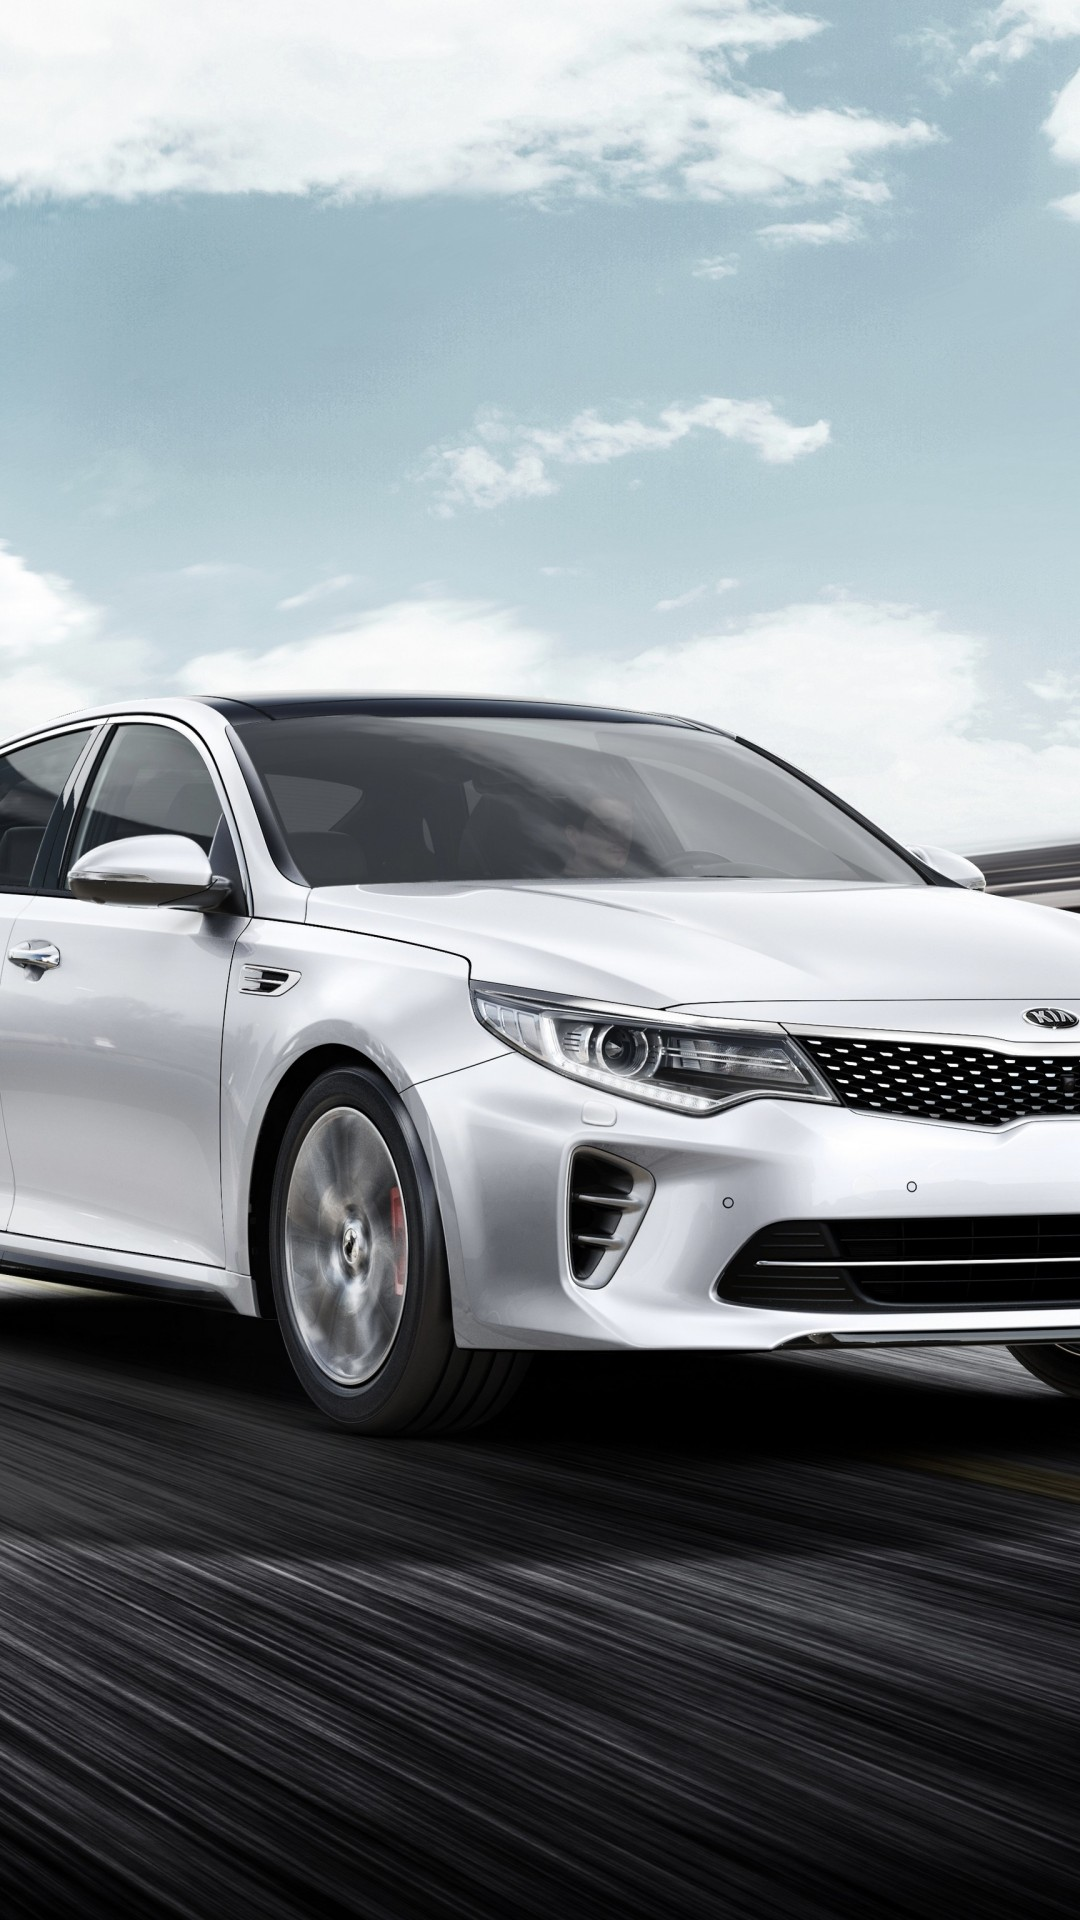 Wallpaper Kia Optima Gt Supercar White Luxury Cars